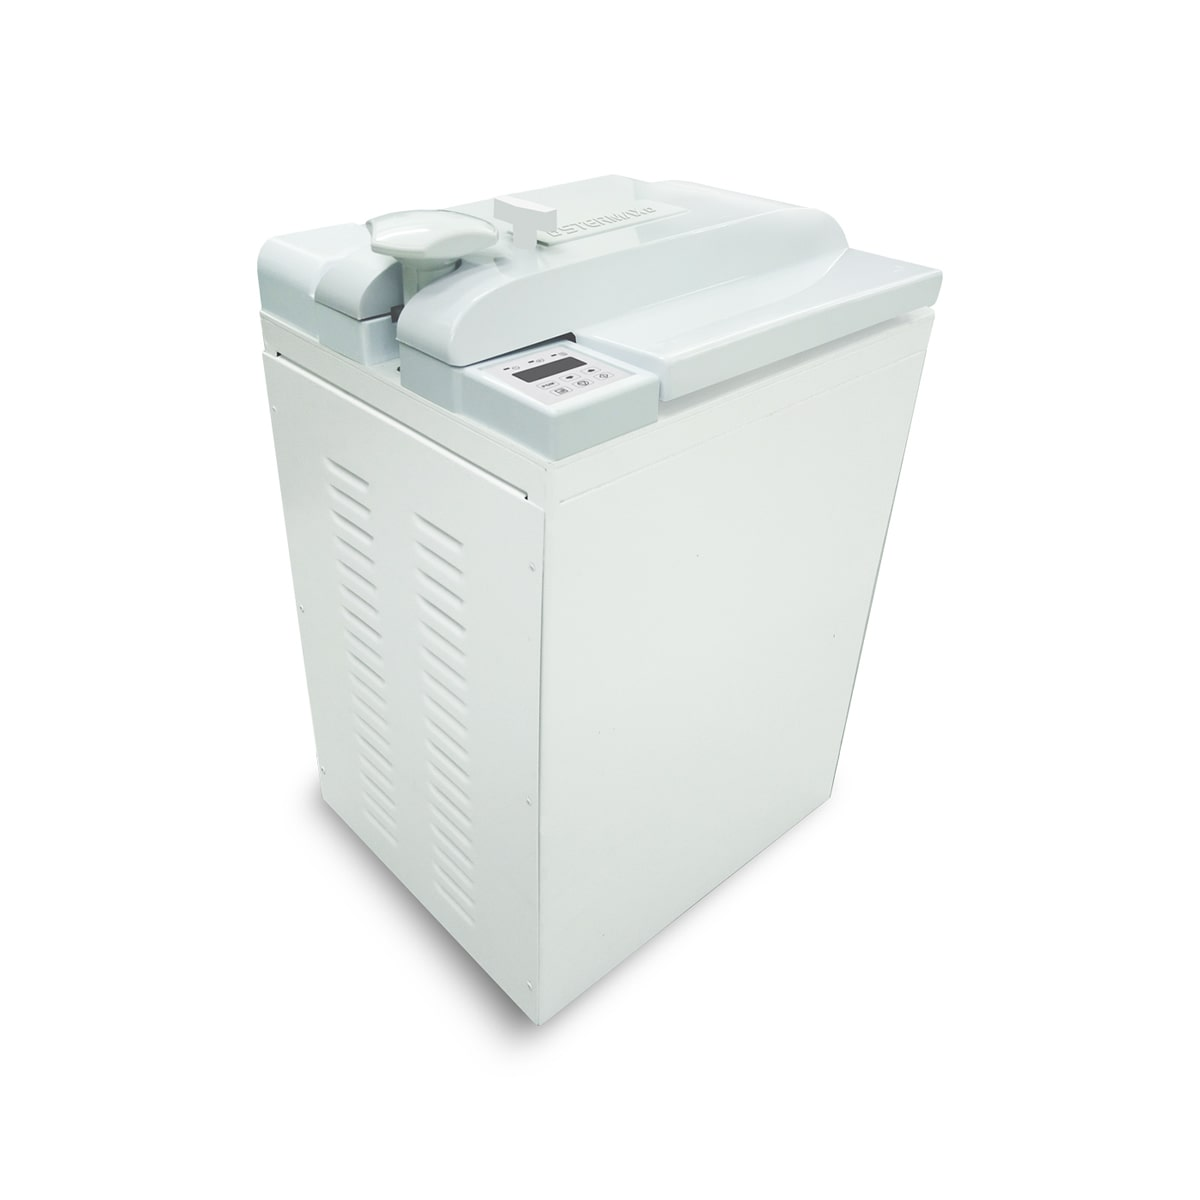 Autoclave Vertical Digital Gravitacional Normal Box 75 litros  Stermax